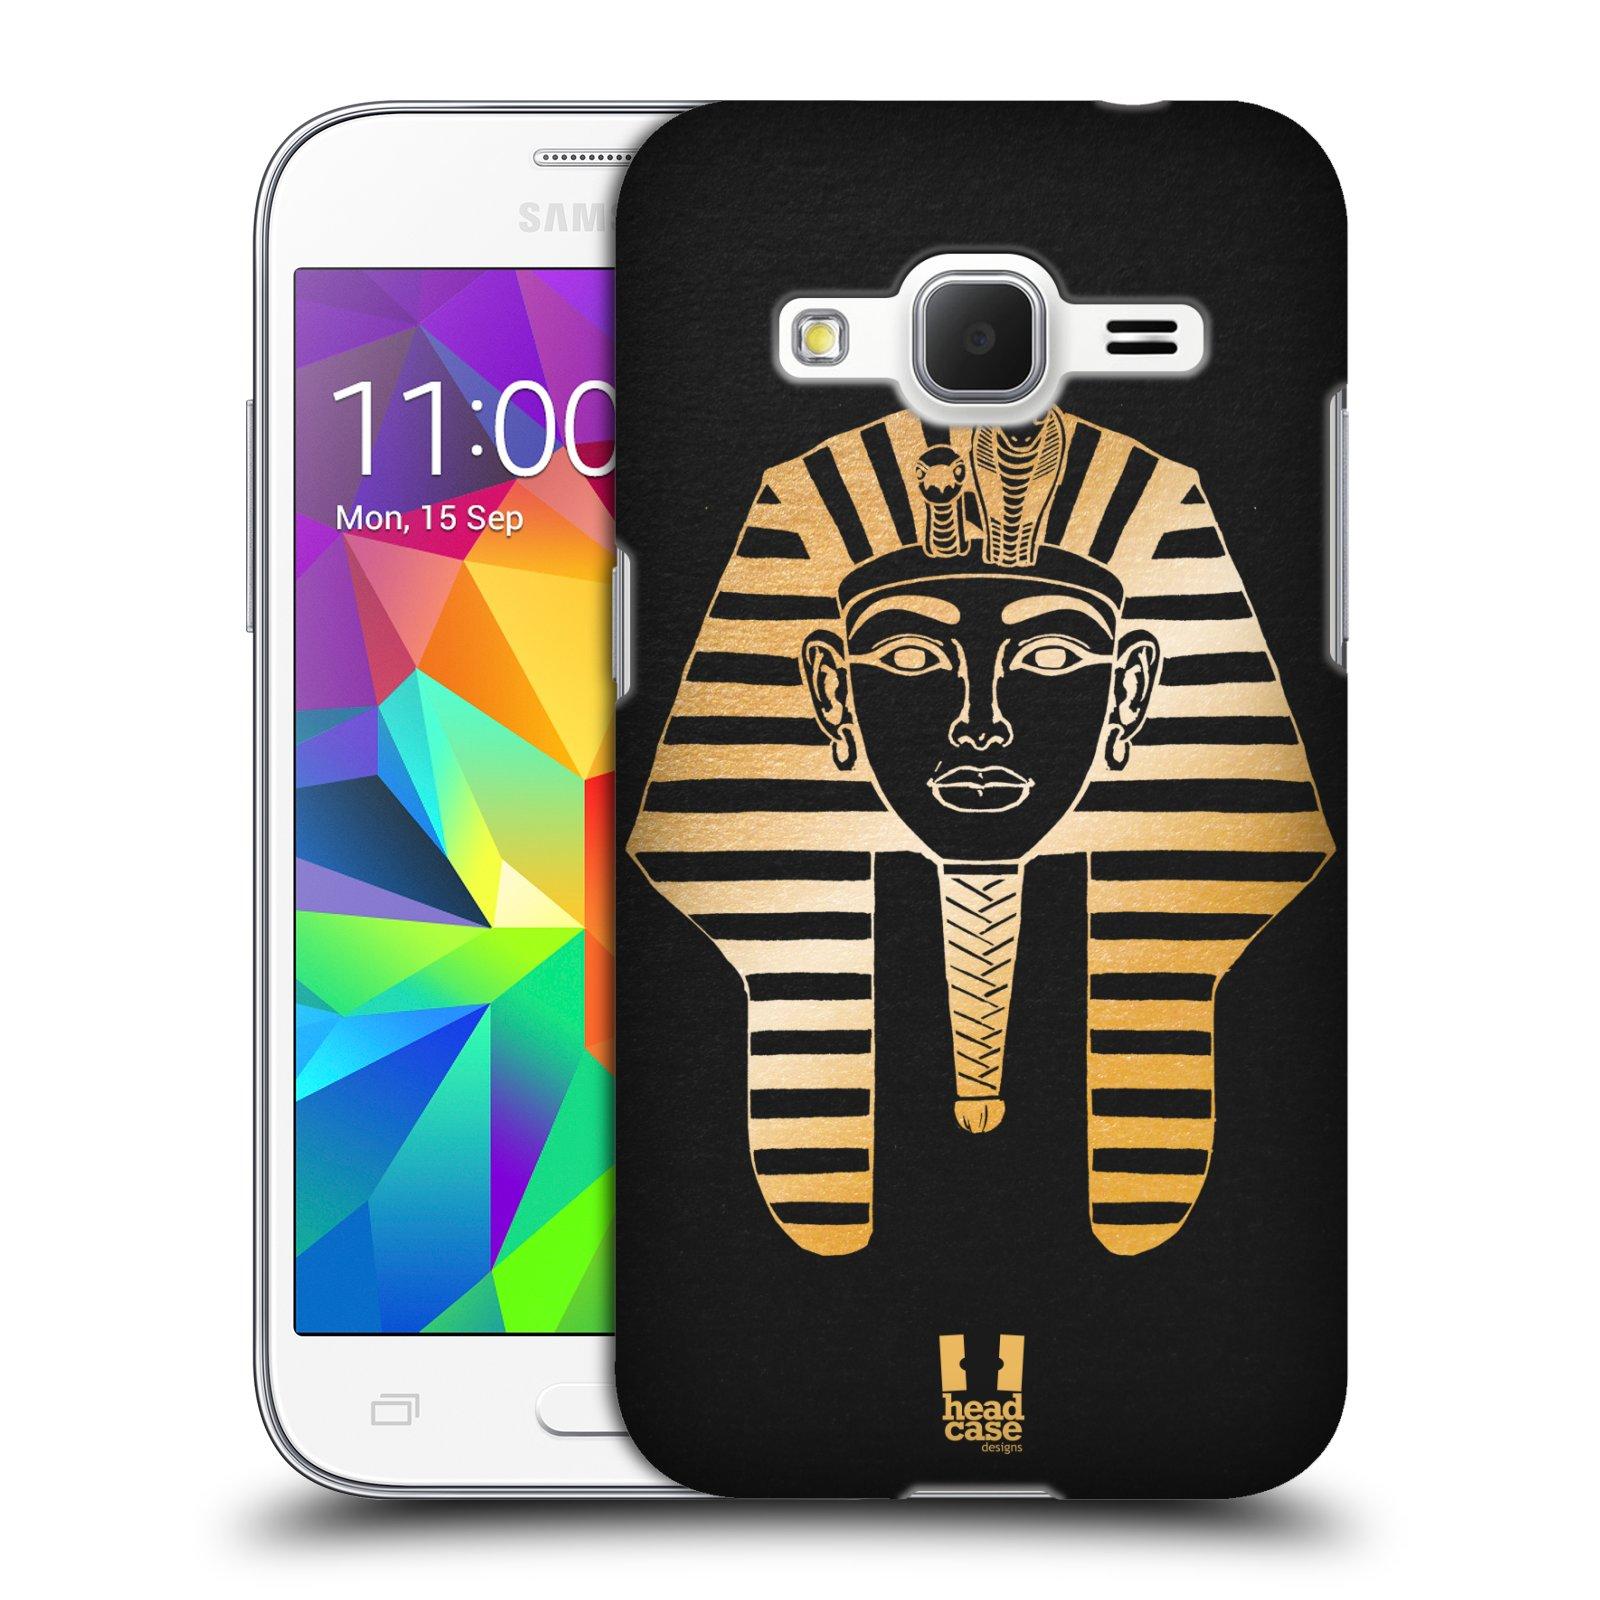 Plastové pouzdro na mobil Samsung Galaxy Core Prime VE HEAD CASE EGYPT FARAON (Kryt či obal na mobilní telefon Samsung Galaxy Core Prime LTE VE SM-G361F)